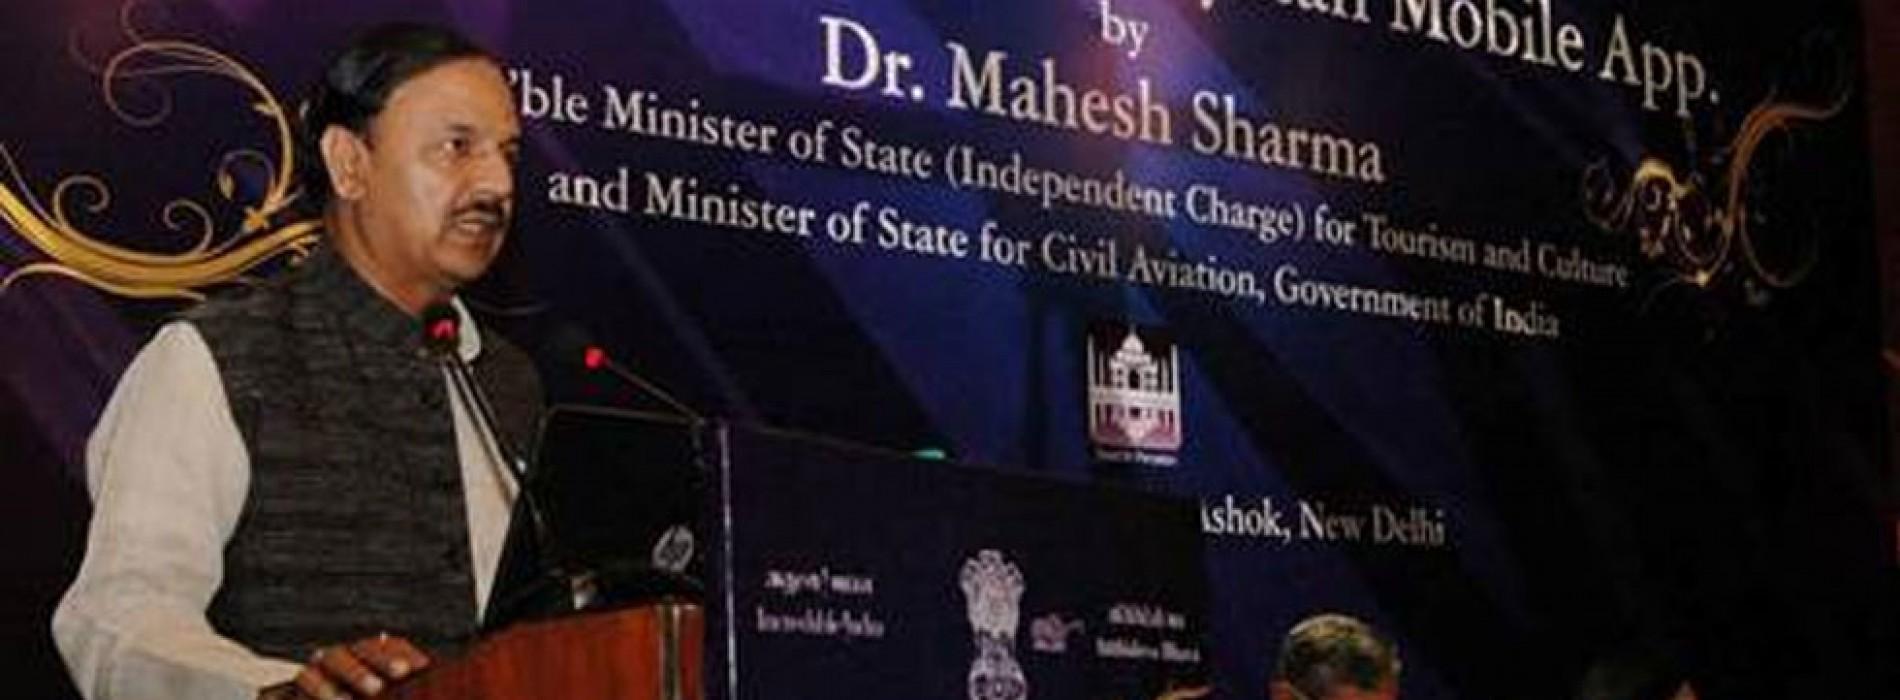 Dr. Mahesh Sharma Launches 'Swachh Paryatan Mobile App'